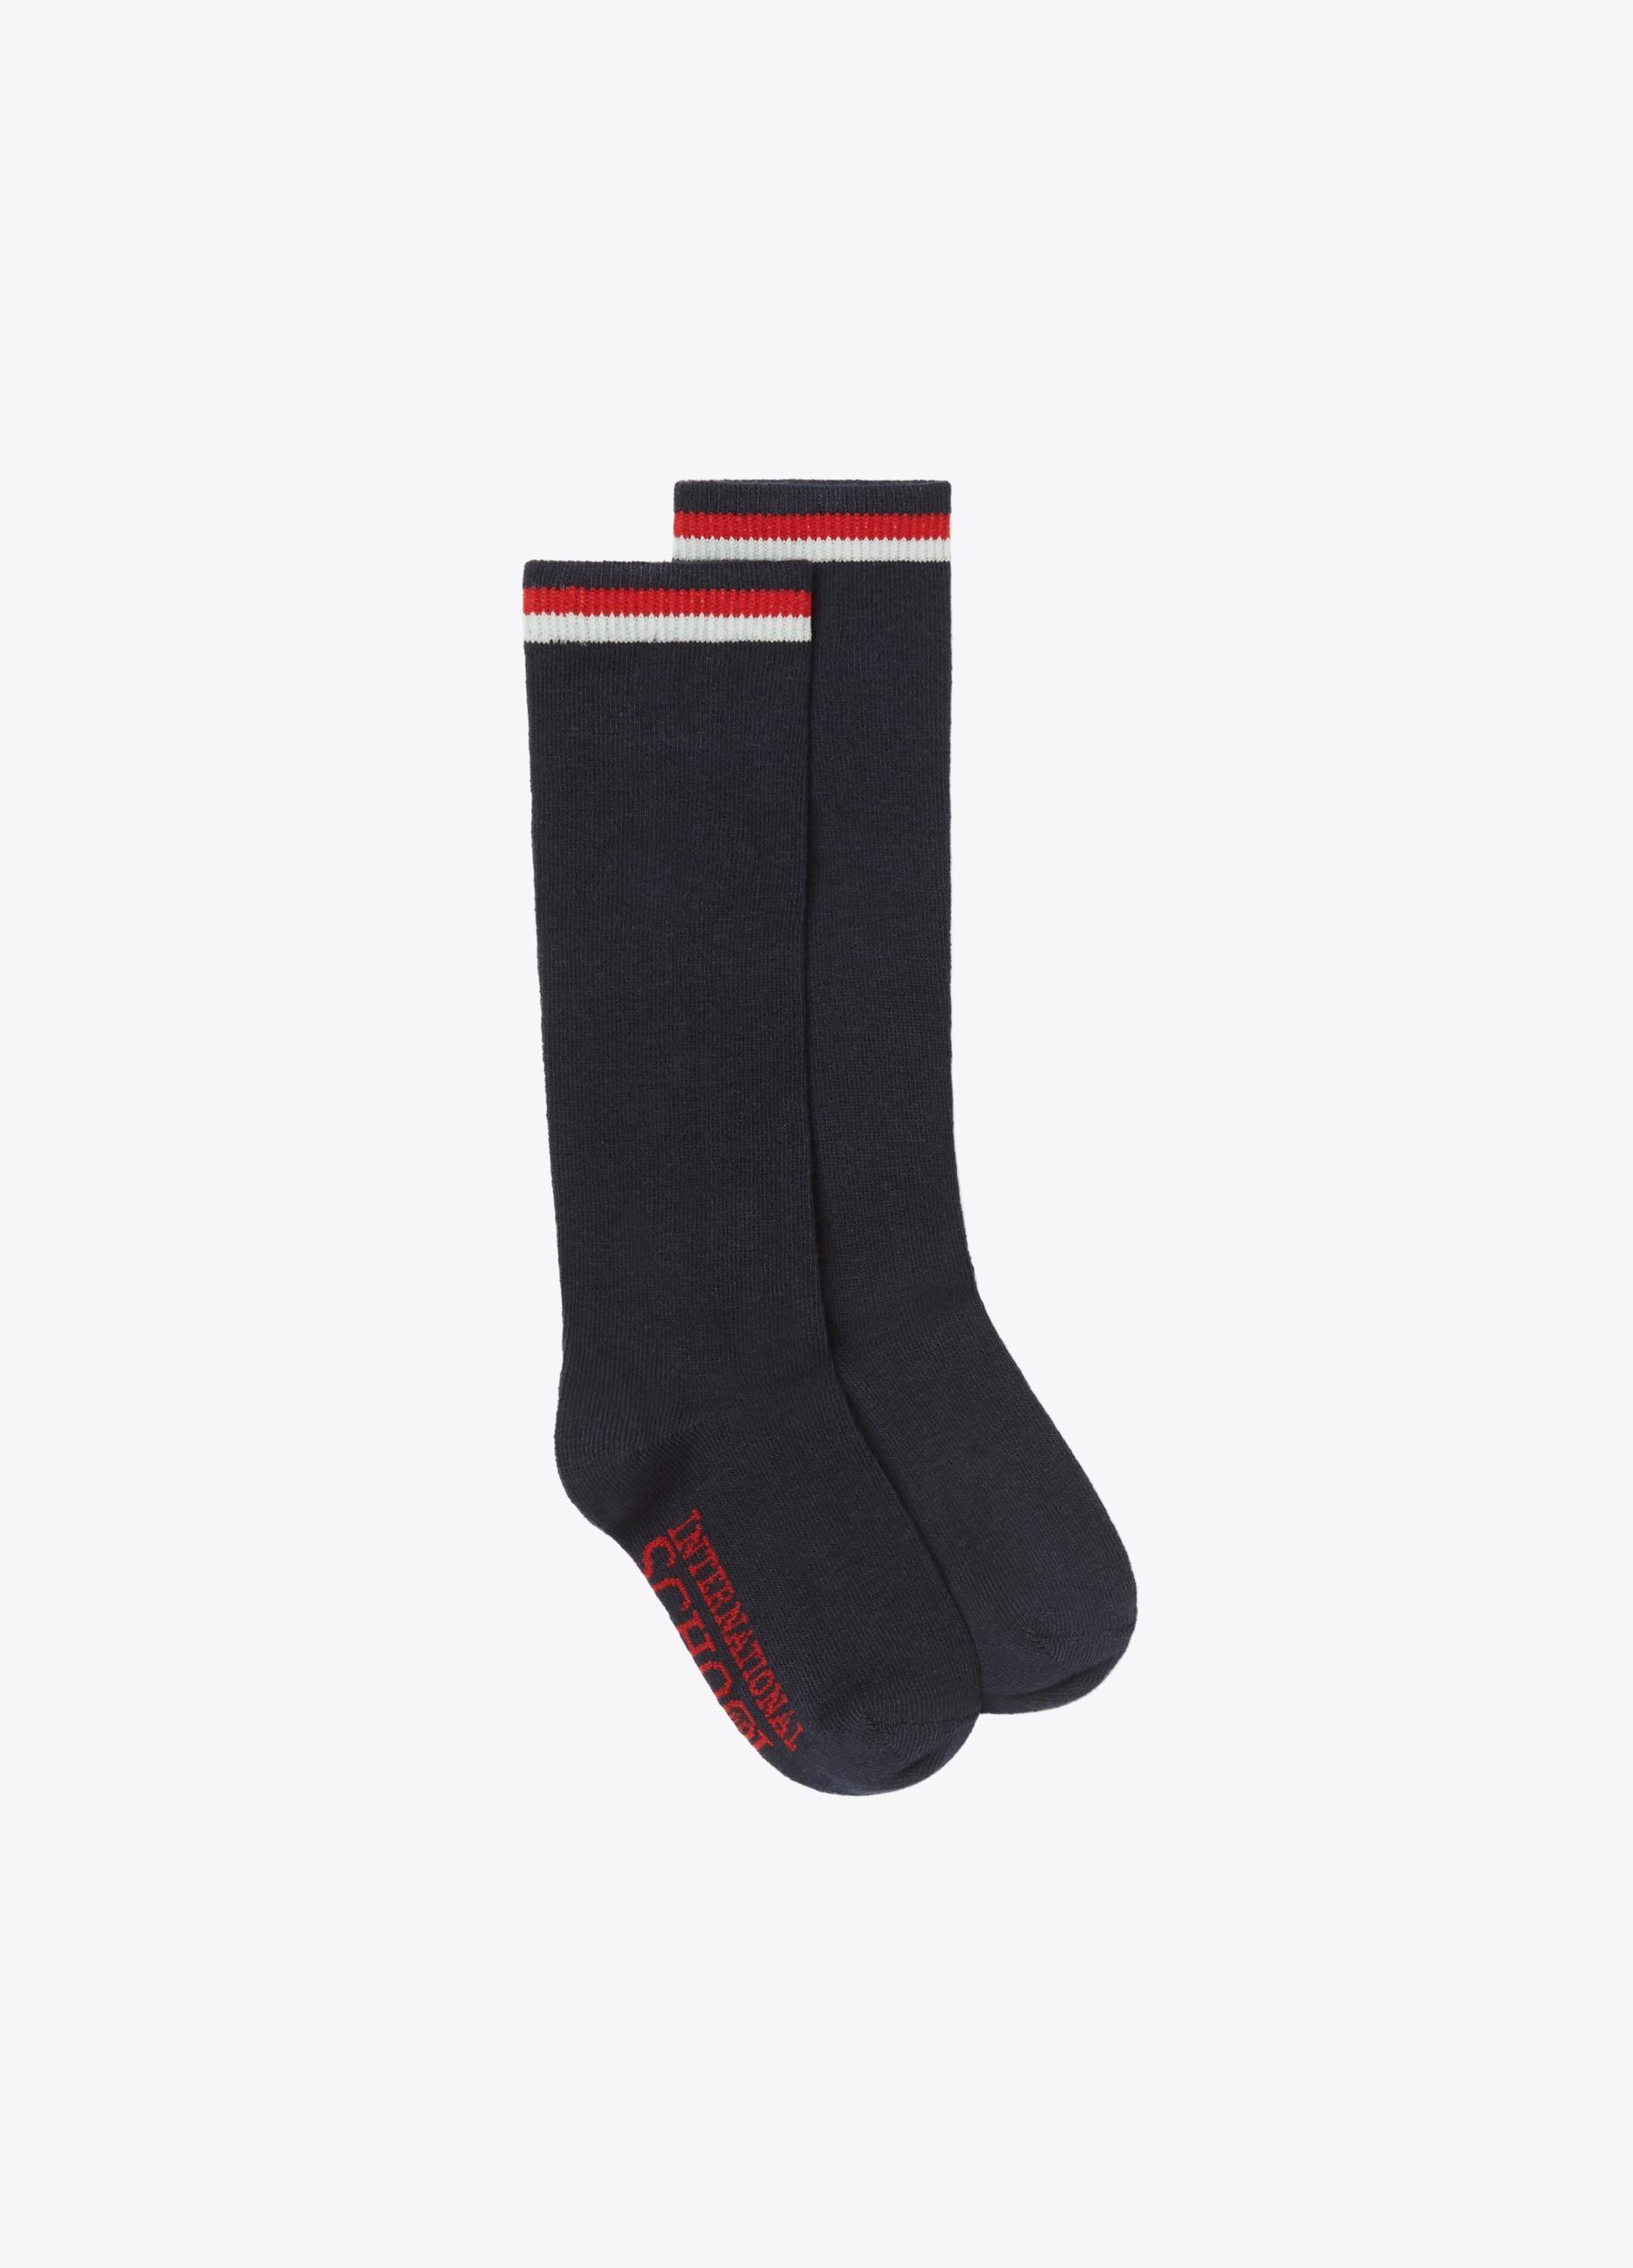 Long stretch socks with ribbing